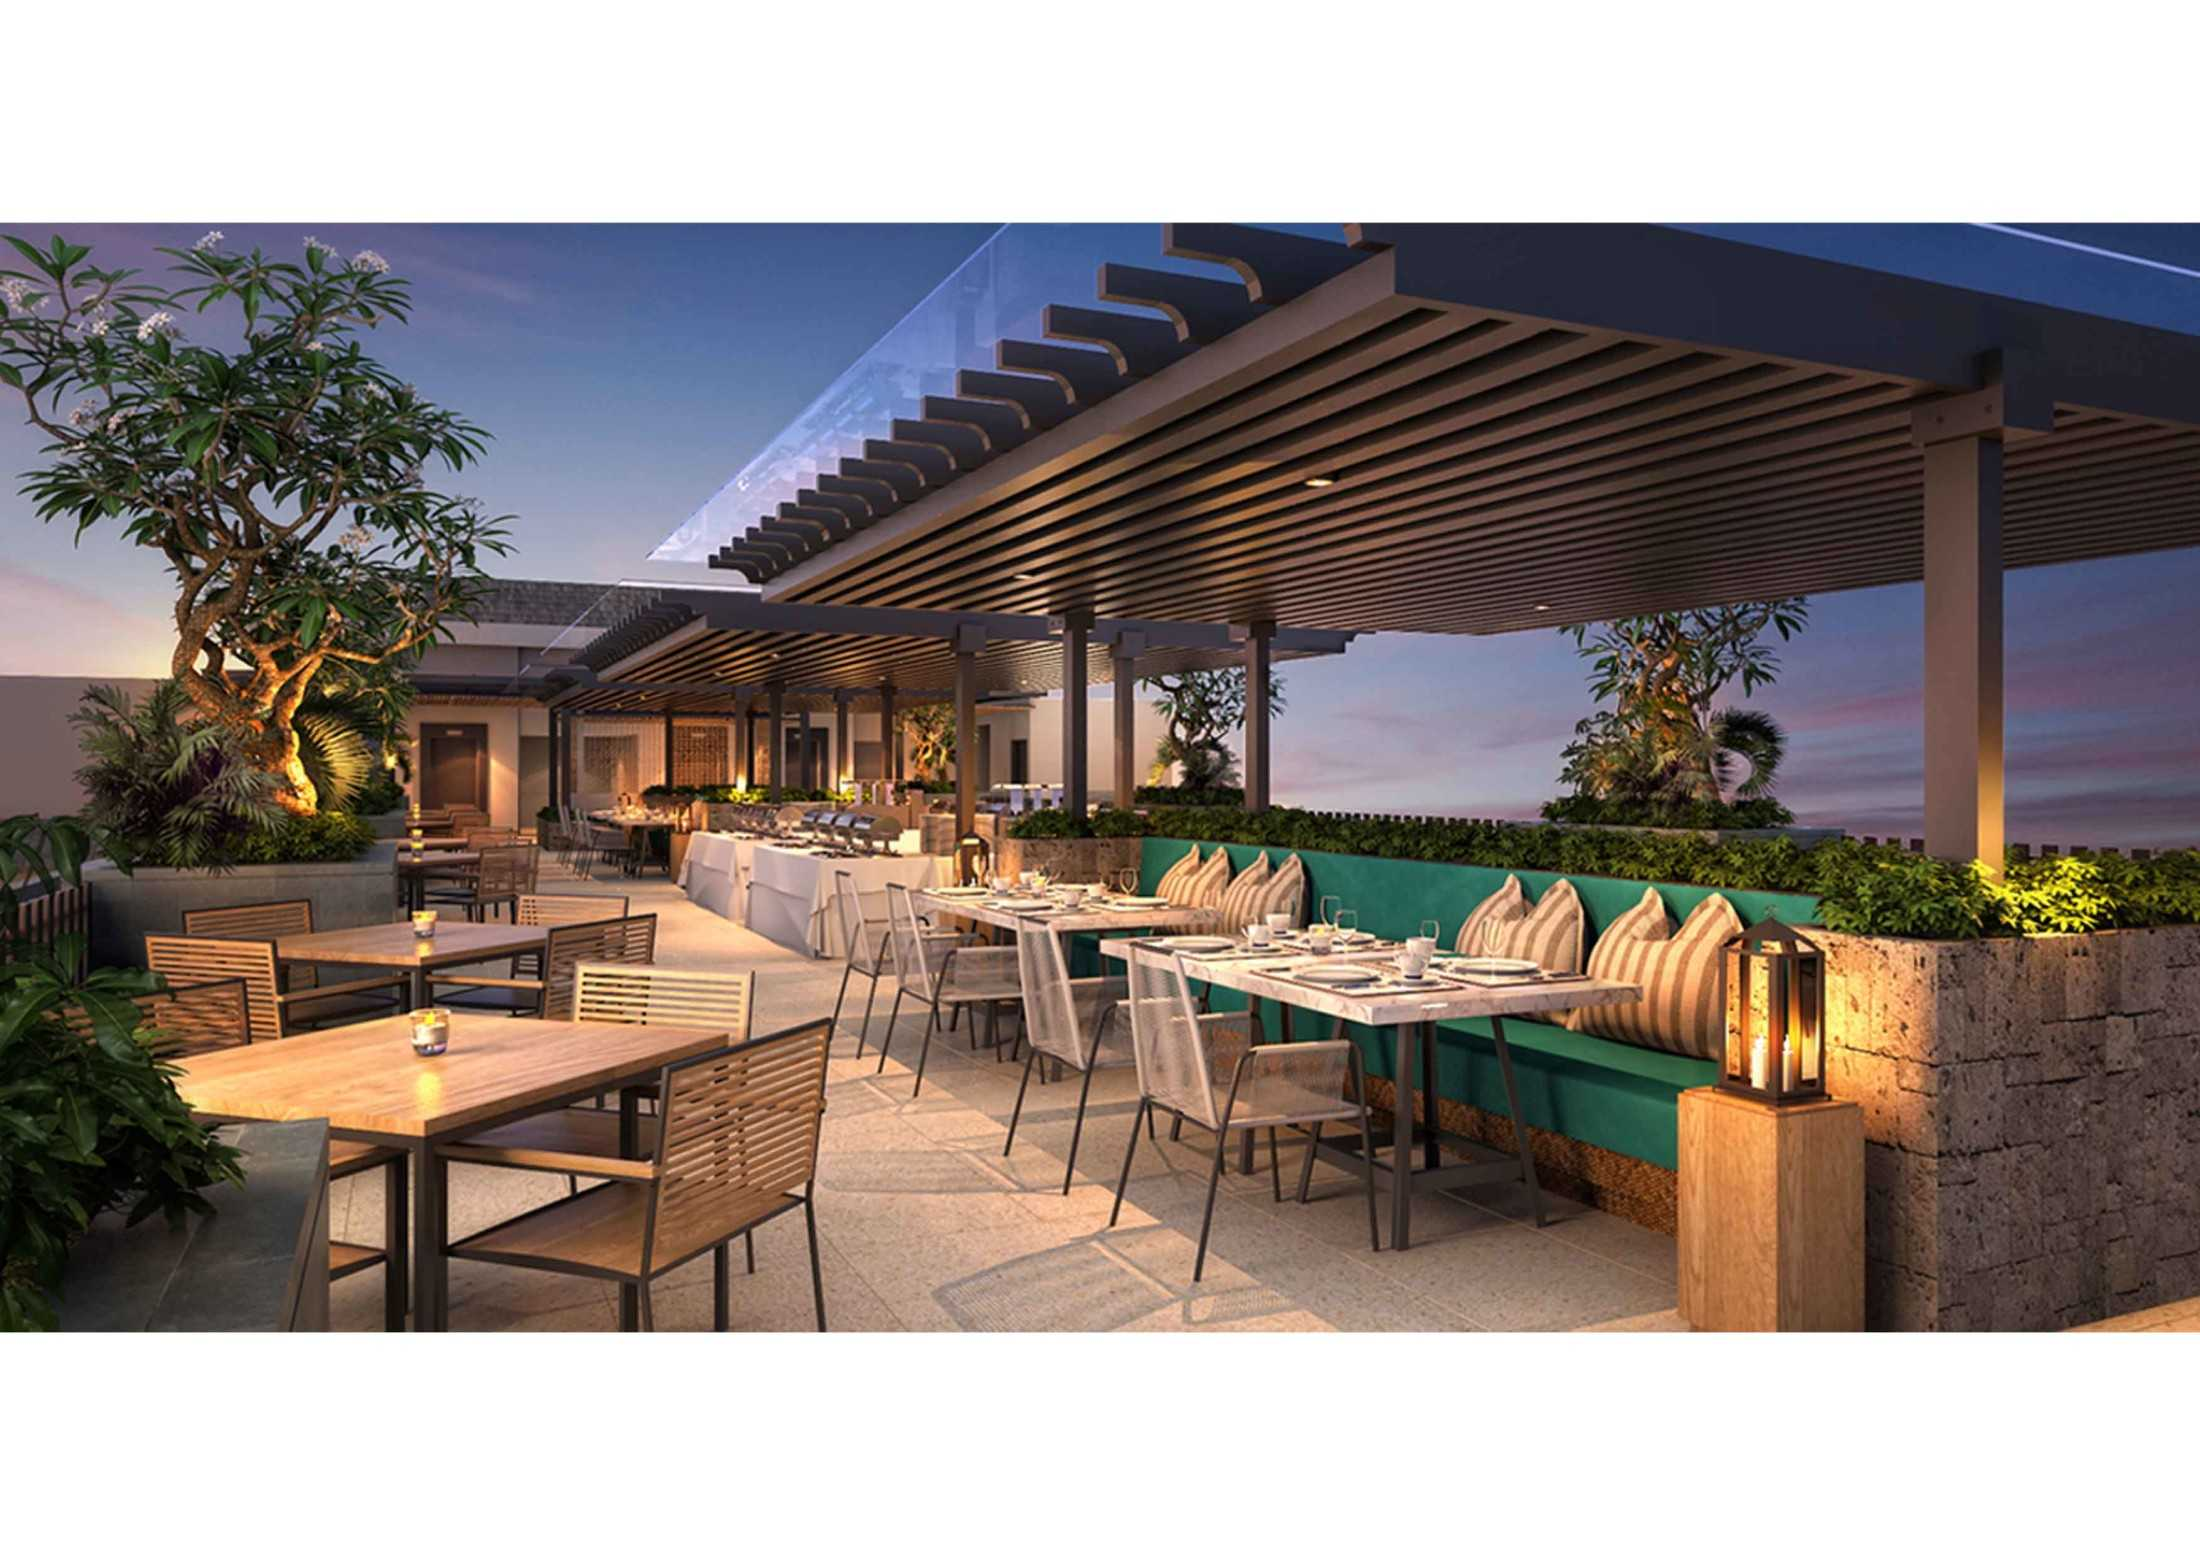 Revan Teggar The Nest Hotel Nusa Dua - Bali Nusa Dua - Bali Revan-Teggar-The-Nest-Hotel  107367